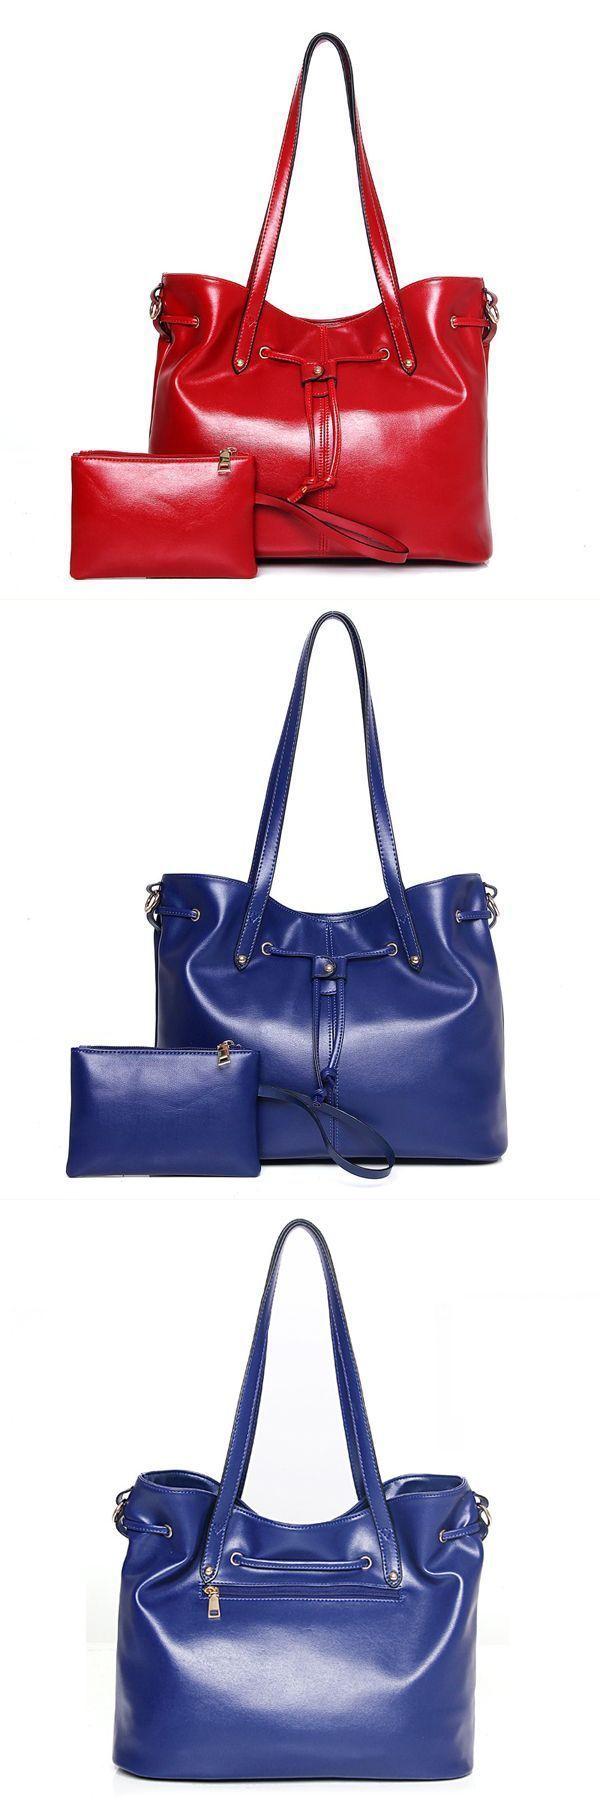 2 pcs women tassel tote handbags casual shoulder bags clutches bags crossbody bags handbags nordstrom rack #86 #handbags #replica #handbags #a/w #2015 #handbags #for #travel #handbags #jumia